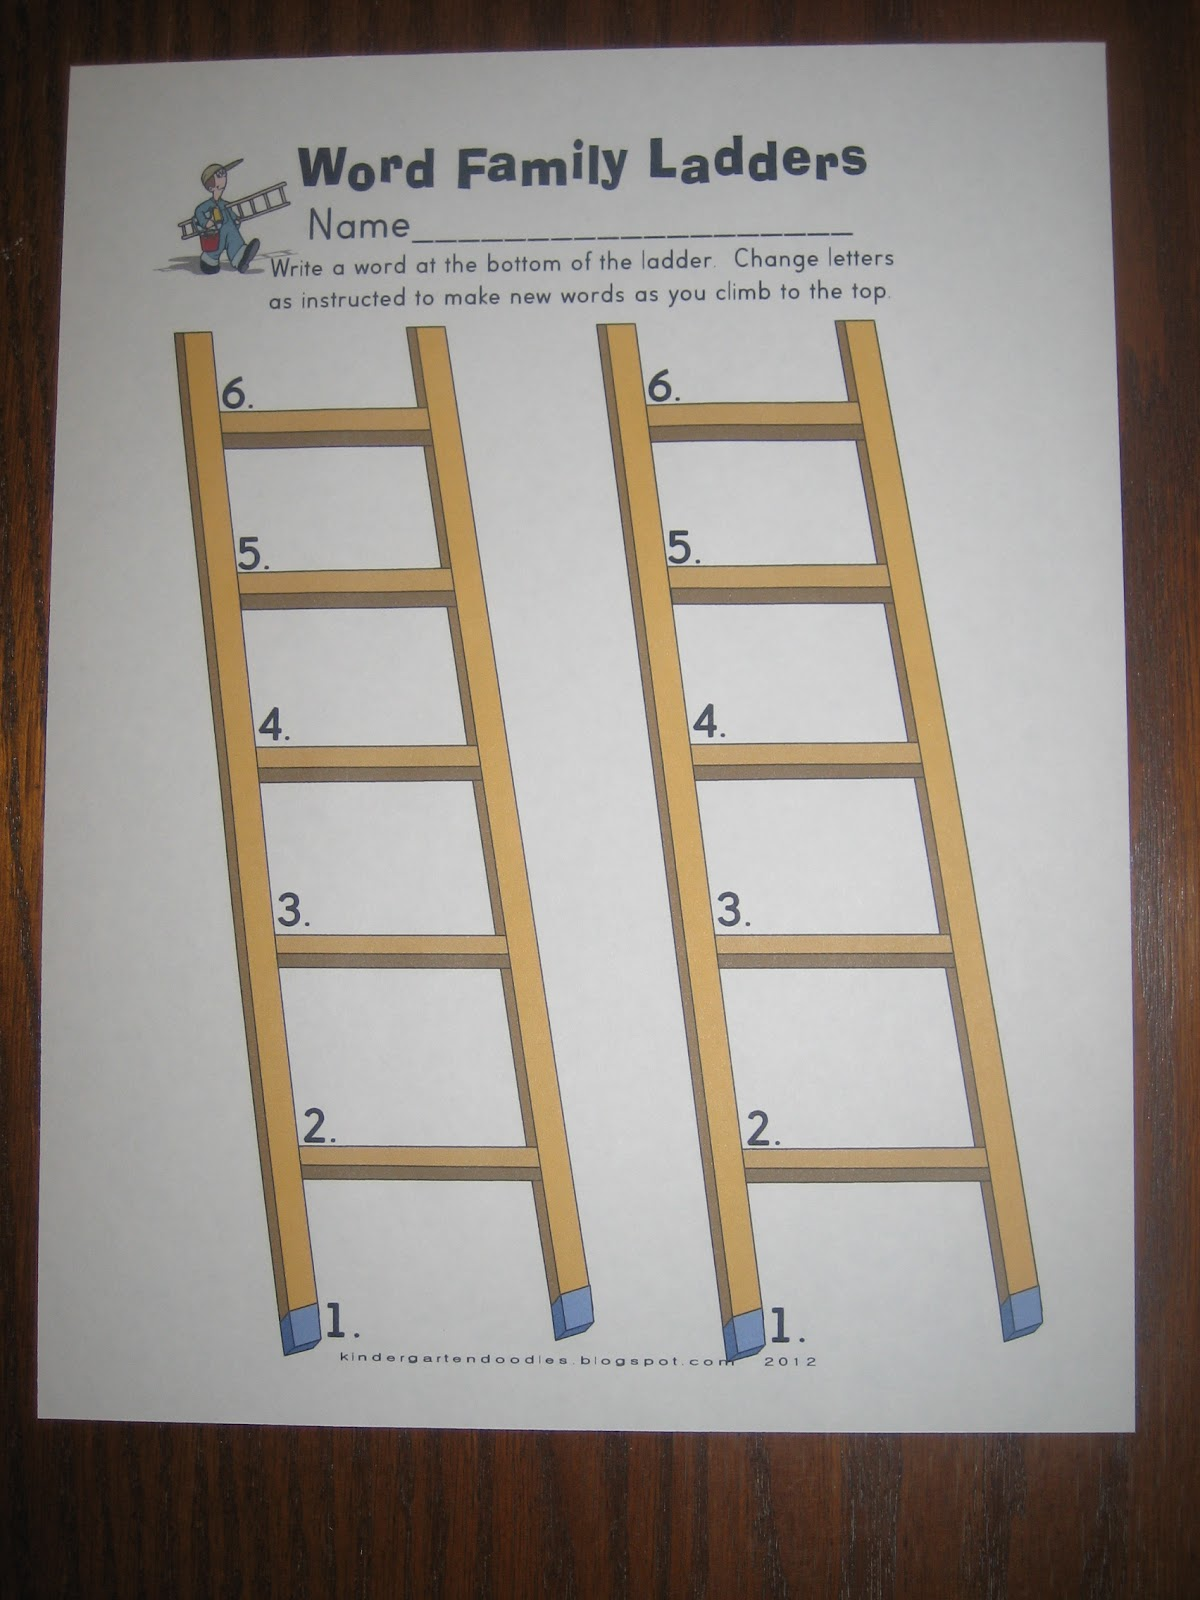 Kinder Doodles Word Family Ladders